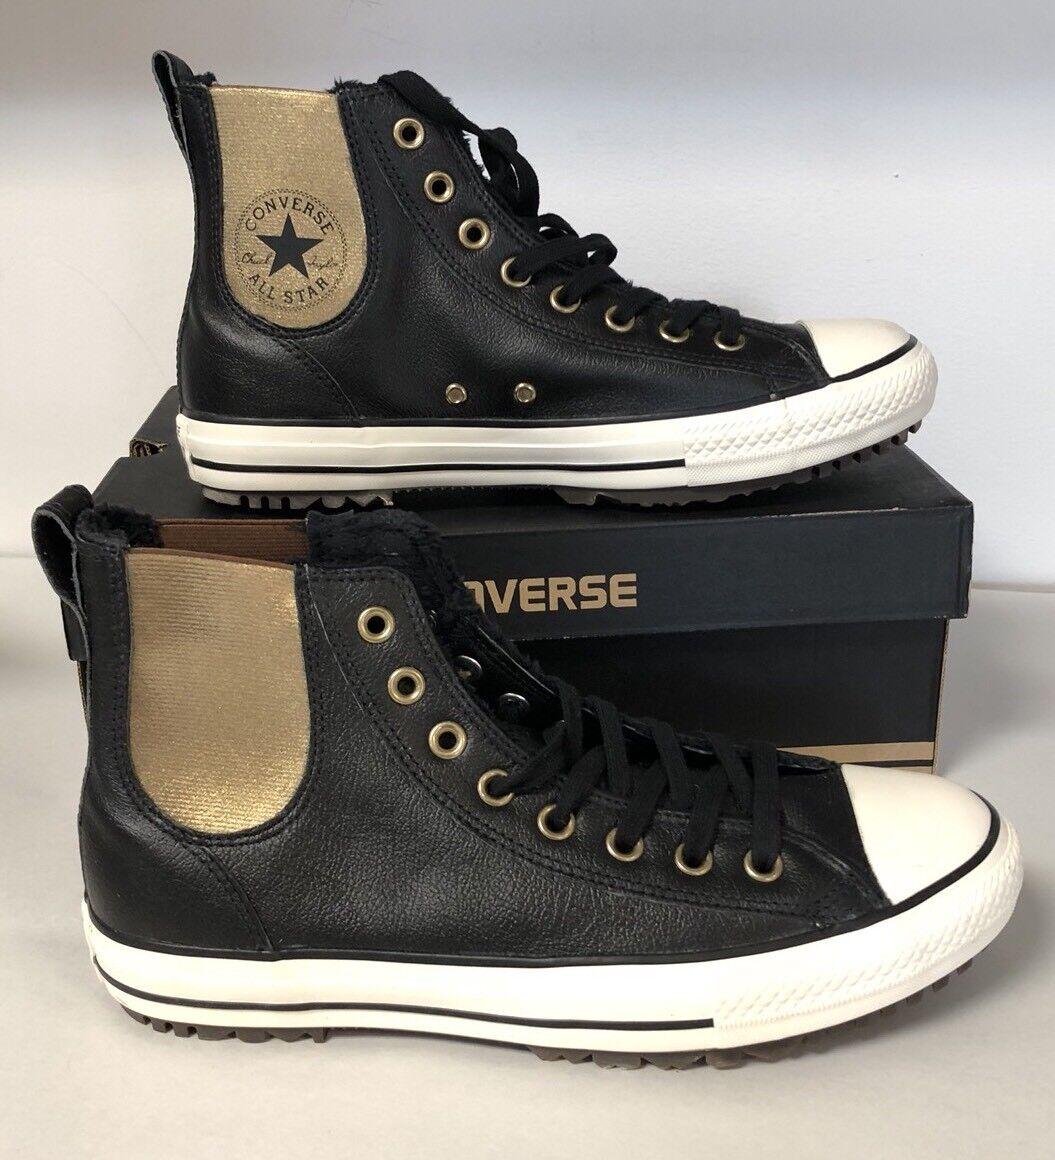 Converse Chuck Taylor All Star Leather High Tops Fur Lined  scarpe da ginnastica Dimensione 10.5